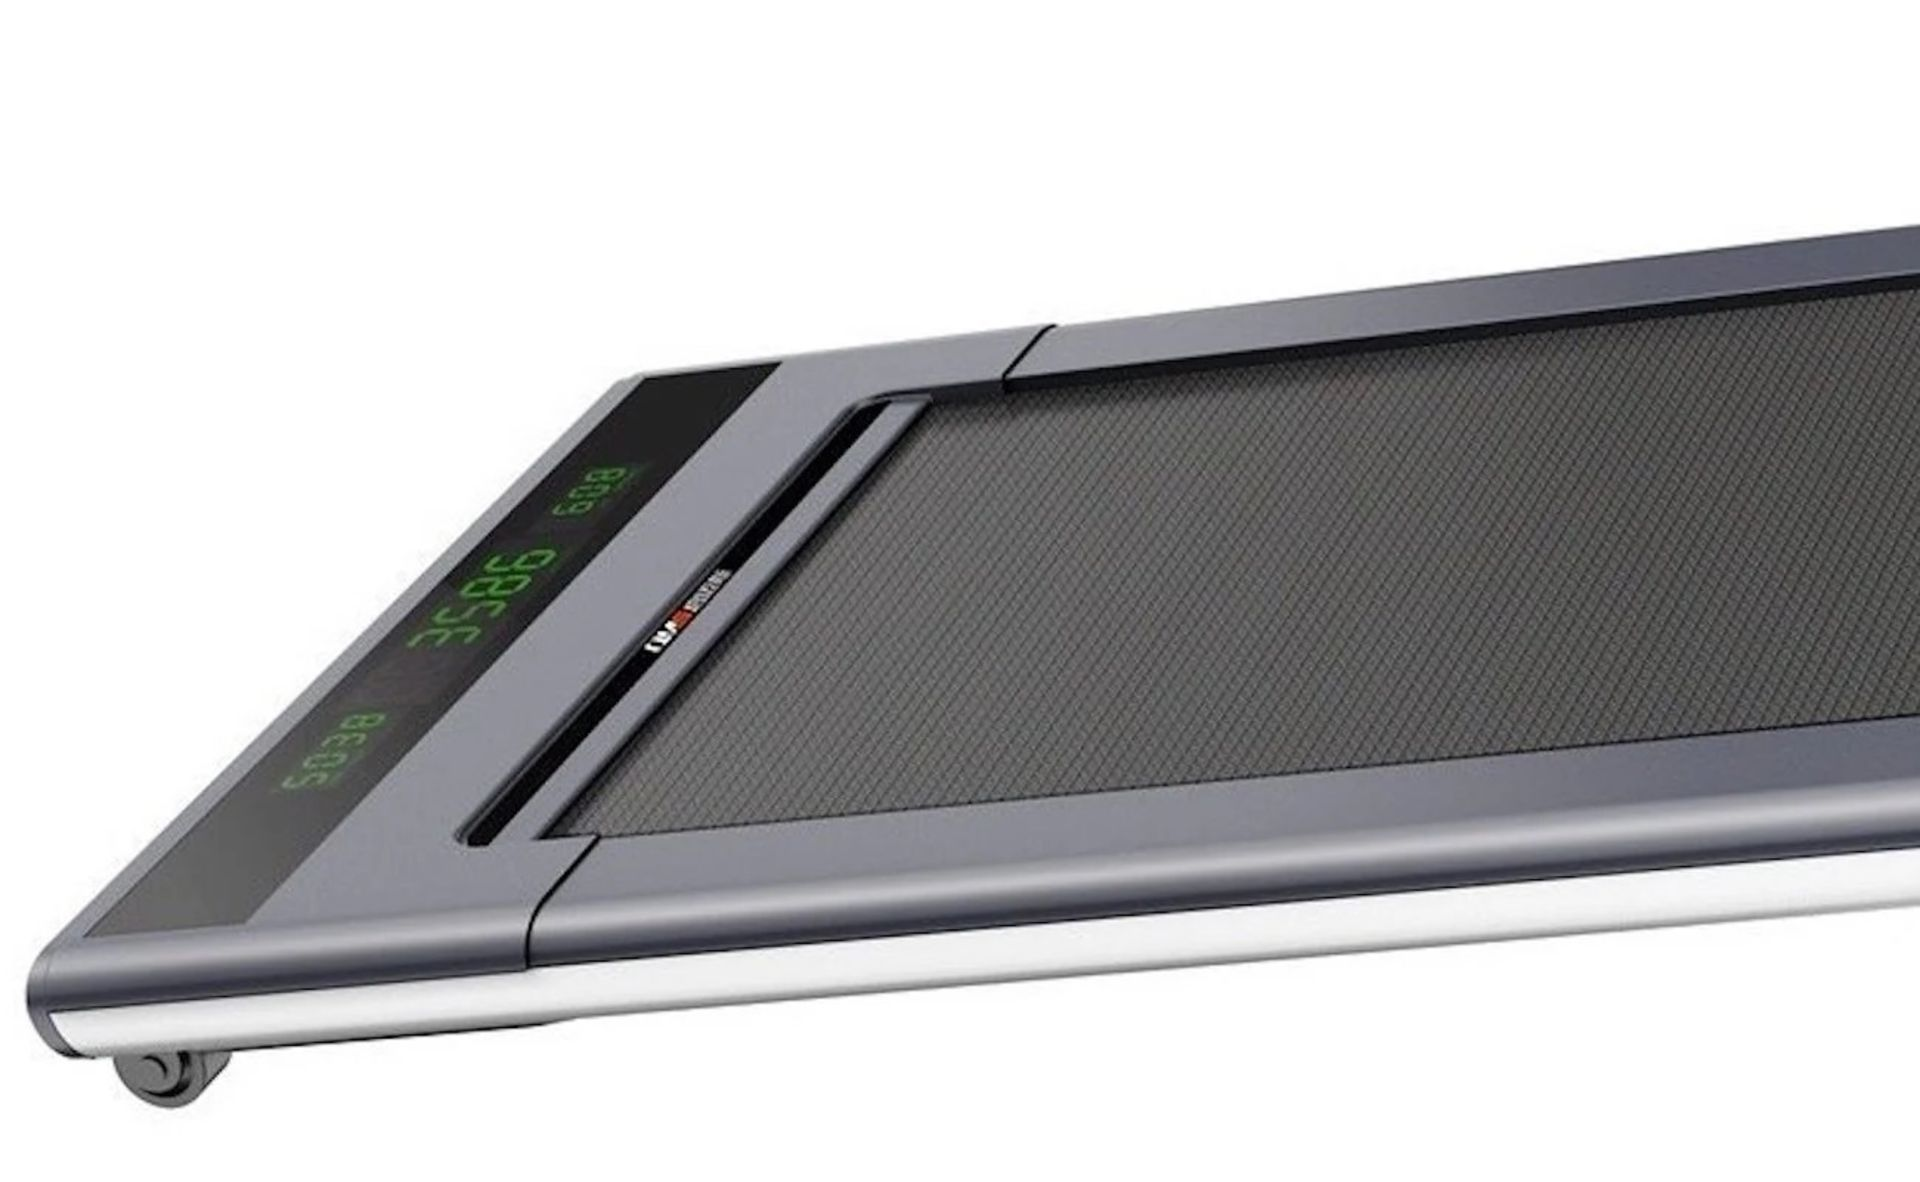 1 x Slim Tread Ultra Thin Smart Treadmill Running / Walking Machine - Lightweight With Folding - Image 5 of 19